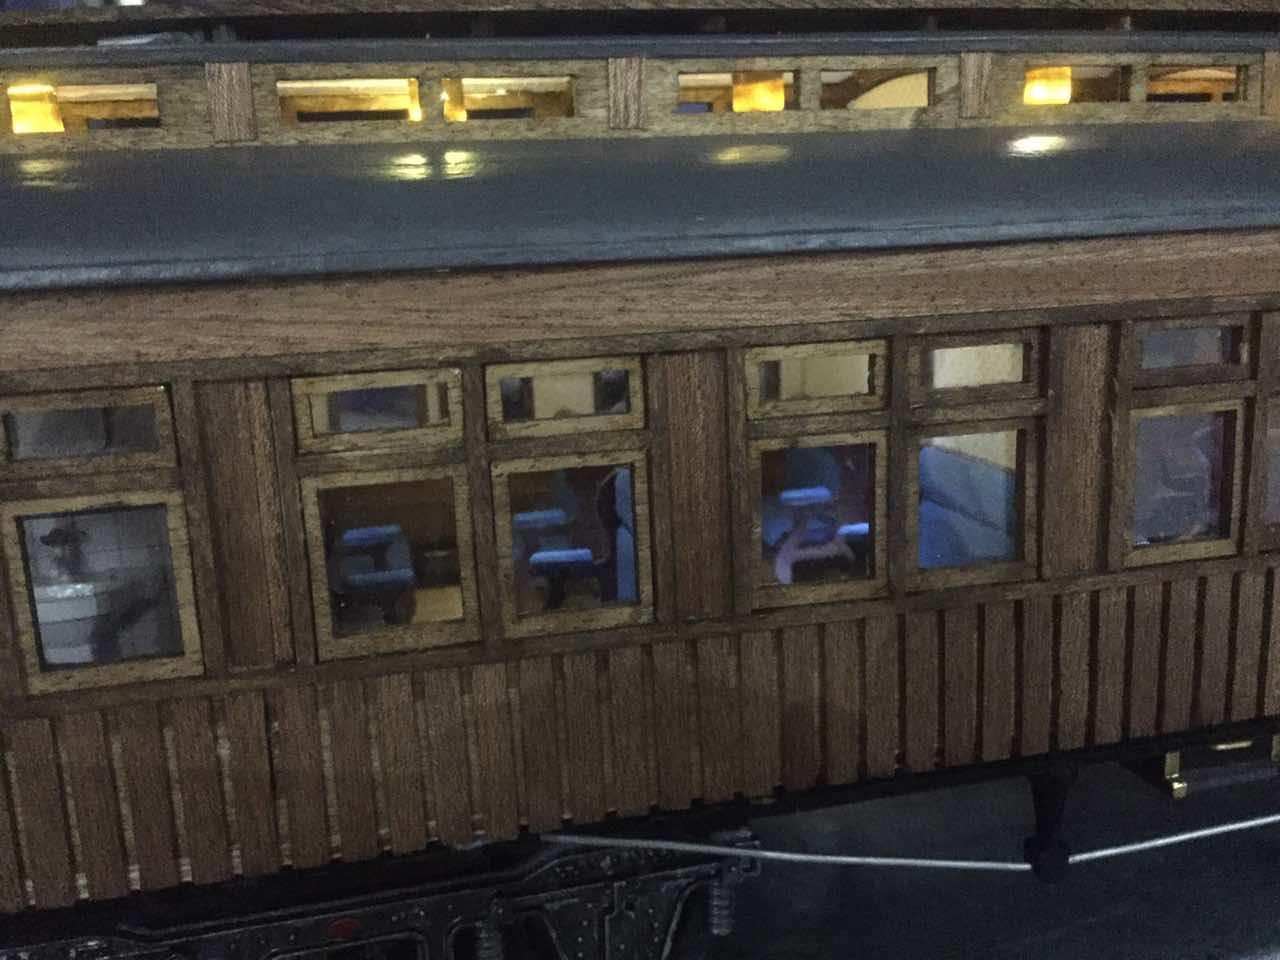 Модель вагона Costa Coach Масштаб 1:32 OcCre (качество фото не очень) UZm5gzCY7bU